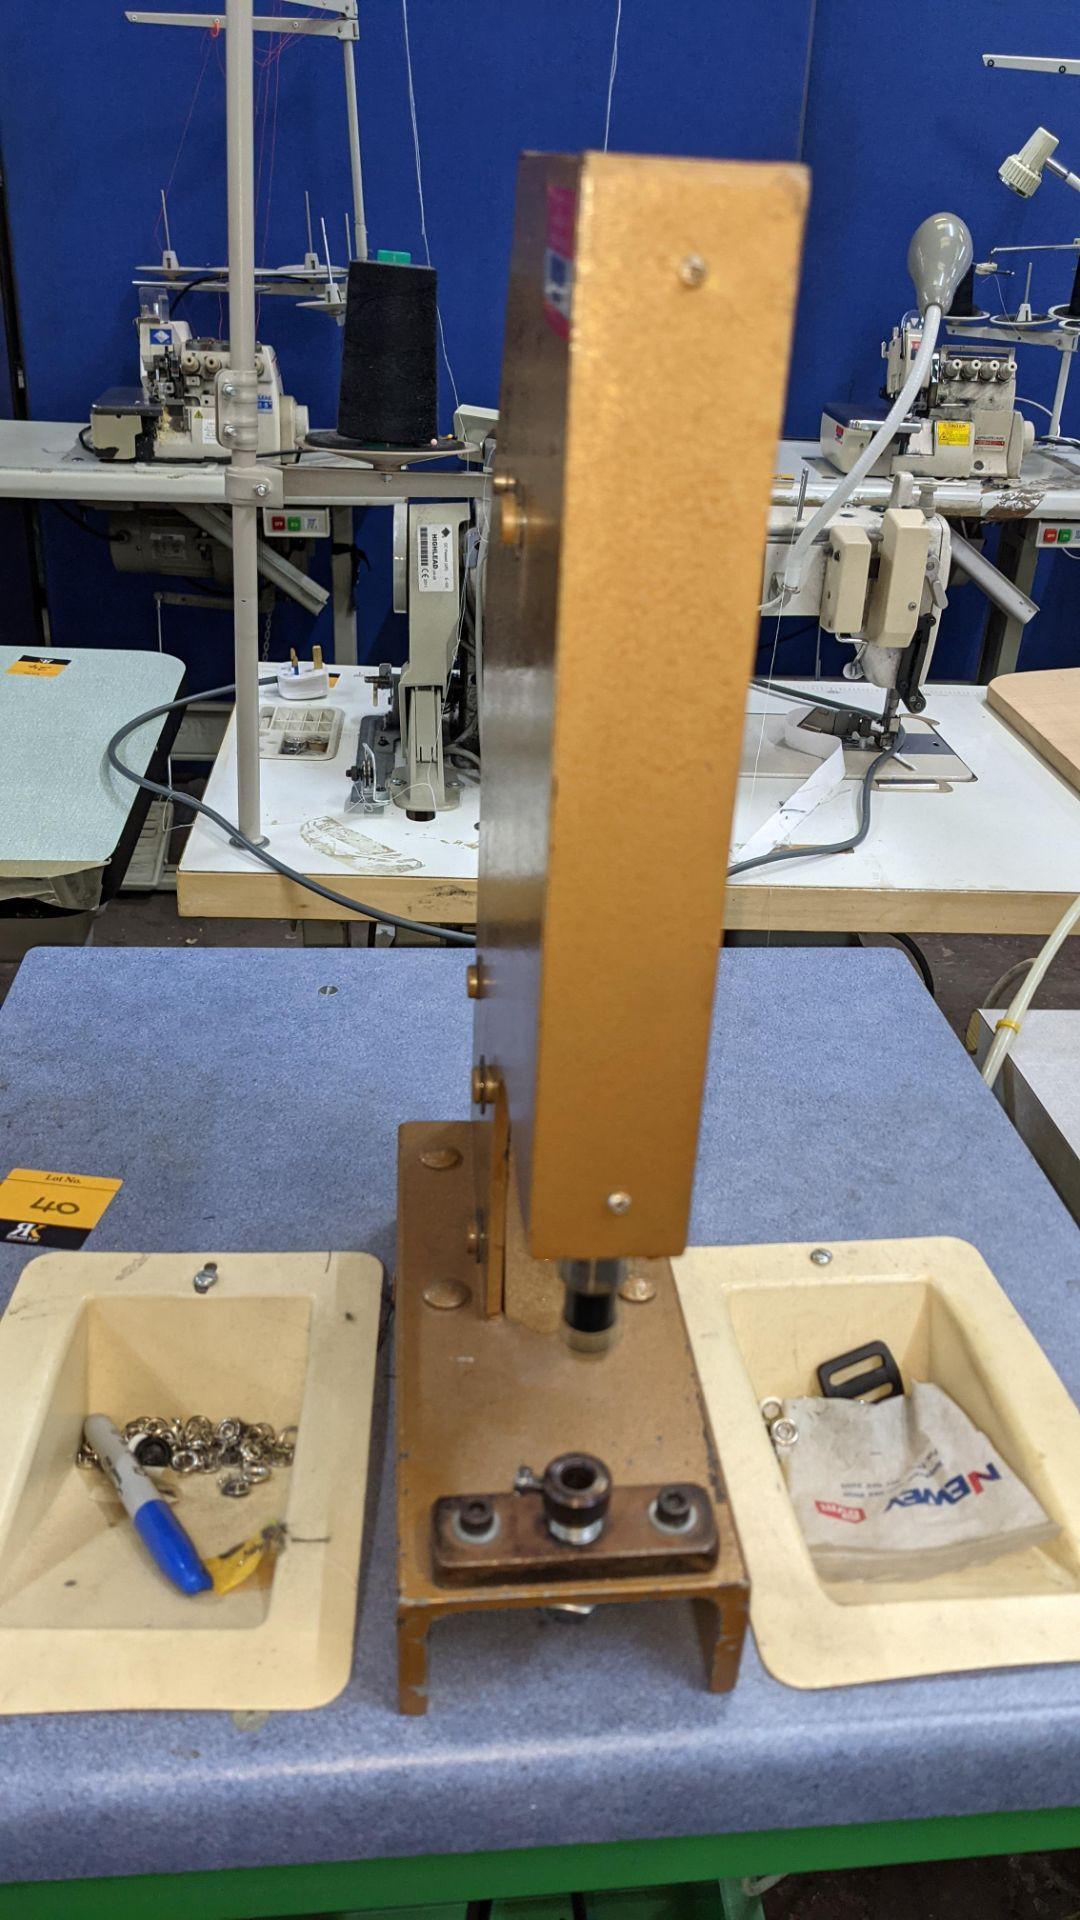 Foot operated riveting machine/press stud machine - Image 5 of 8